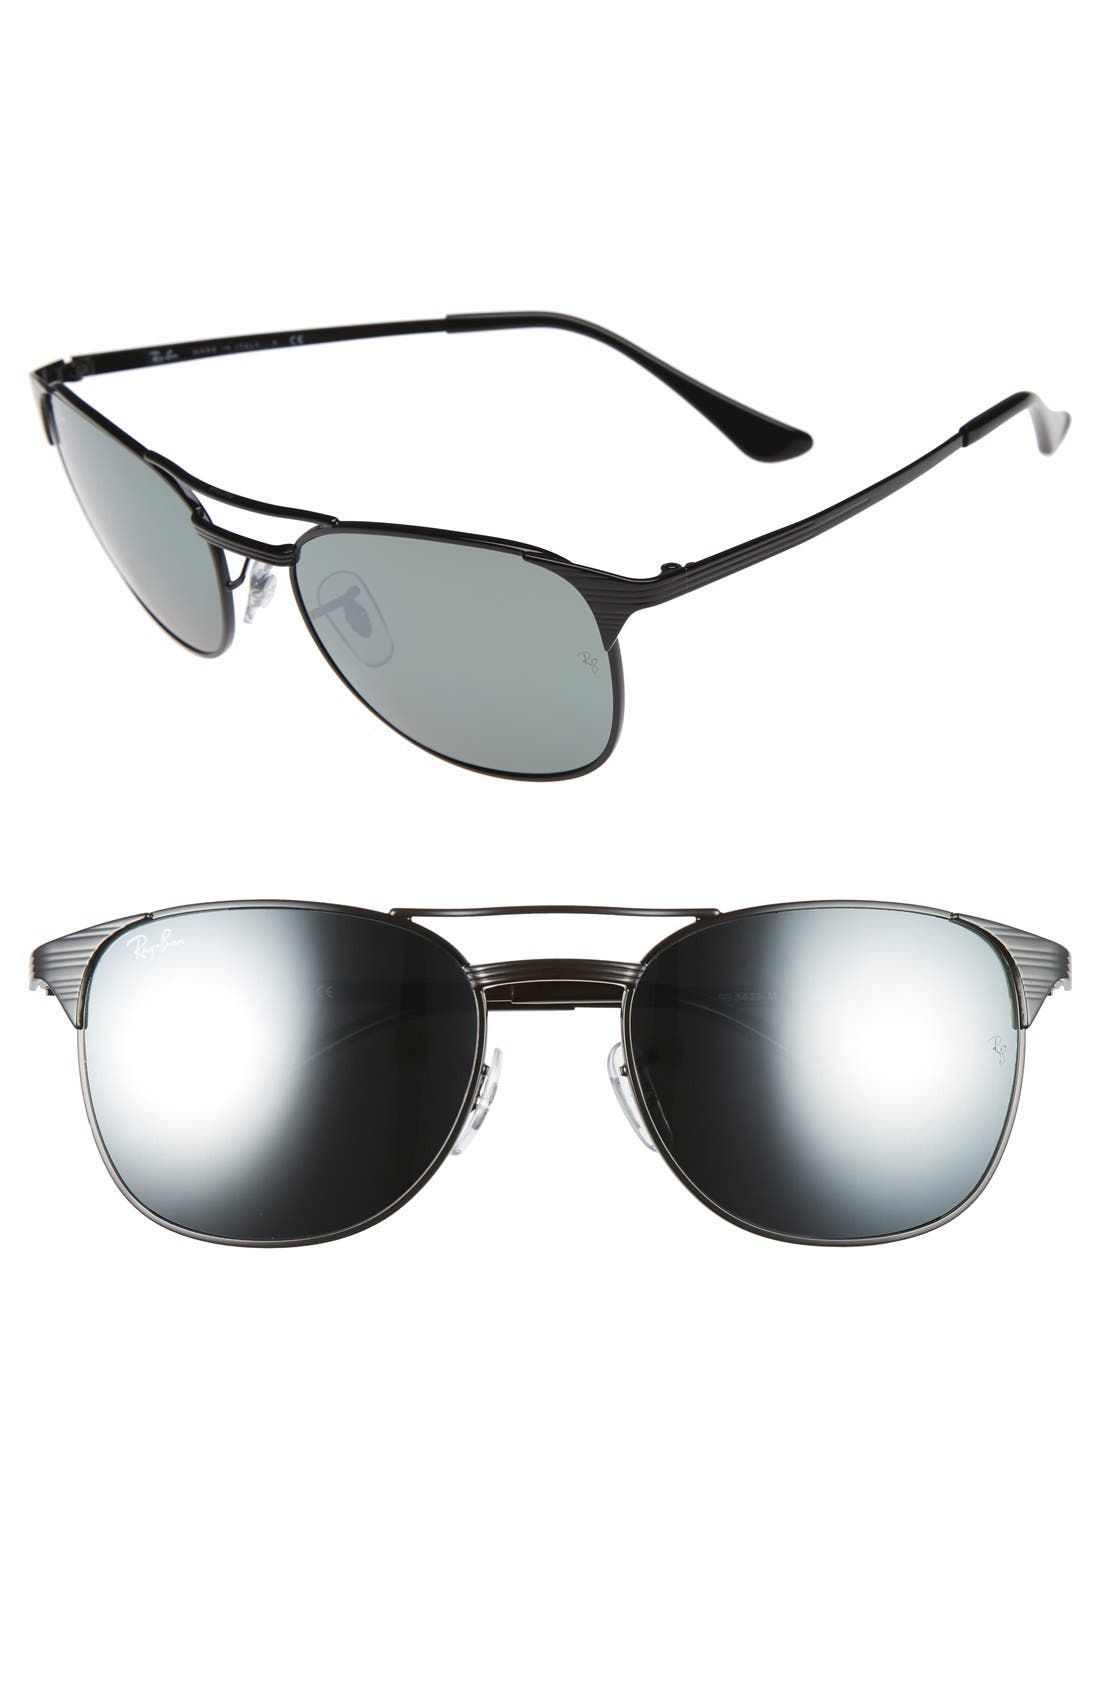 Main Image - Ray-Ban Small Icons 55mm Retro Sunglasses